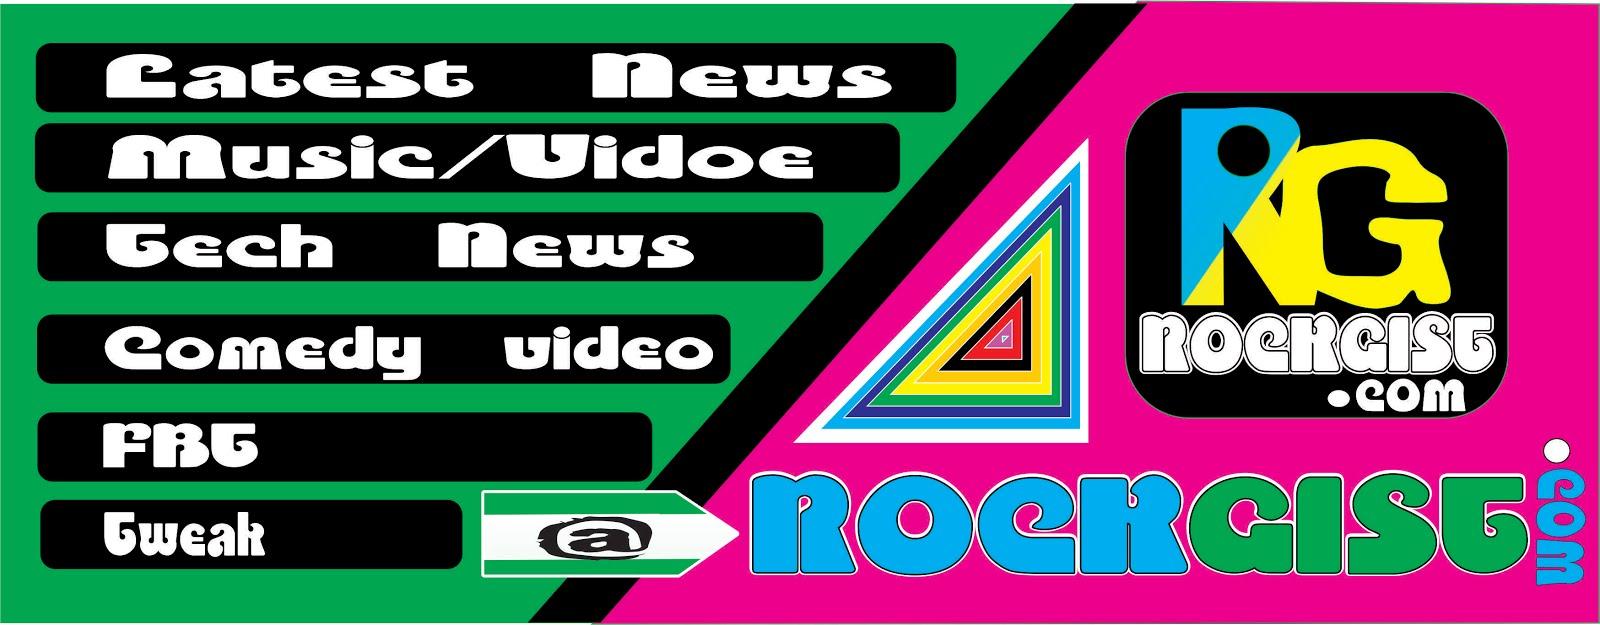 Rockgist.com